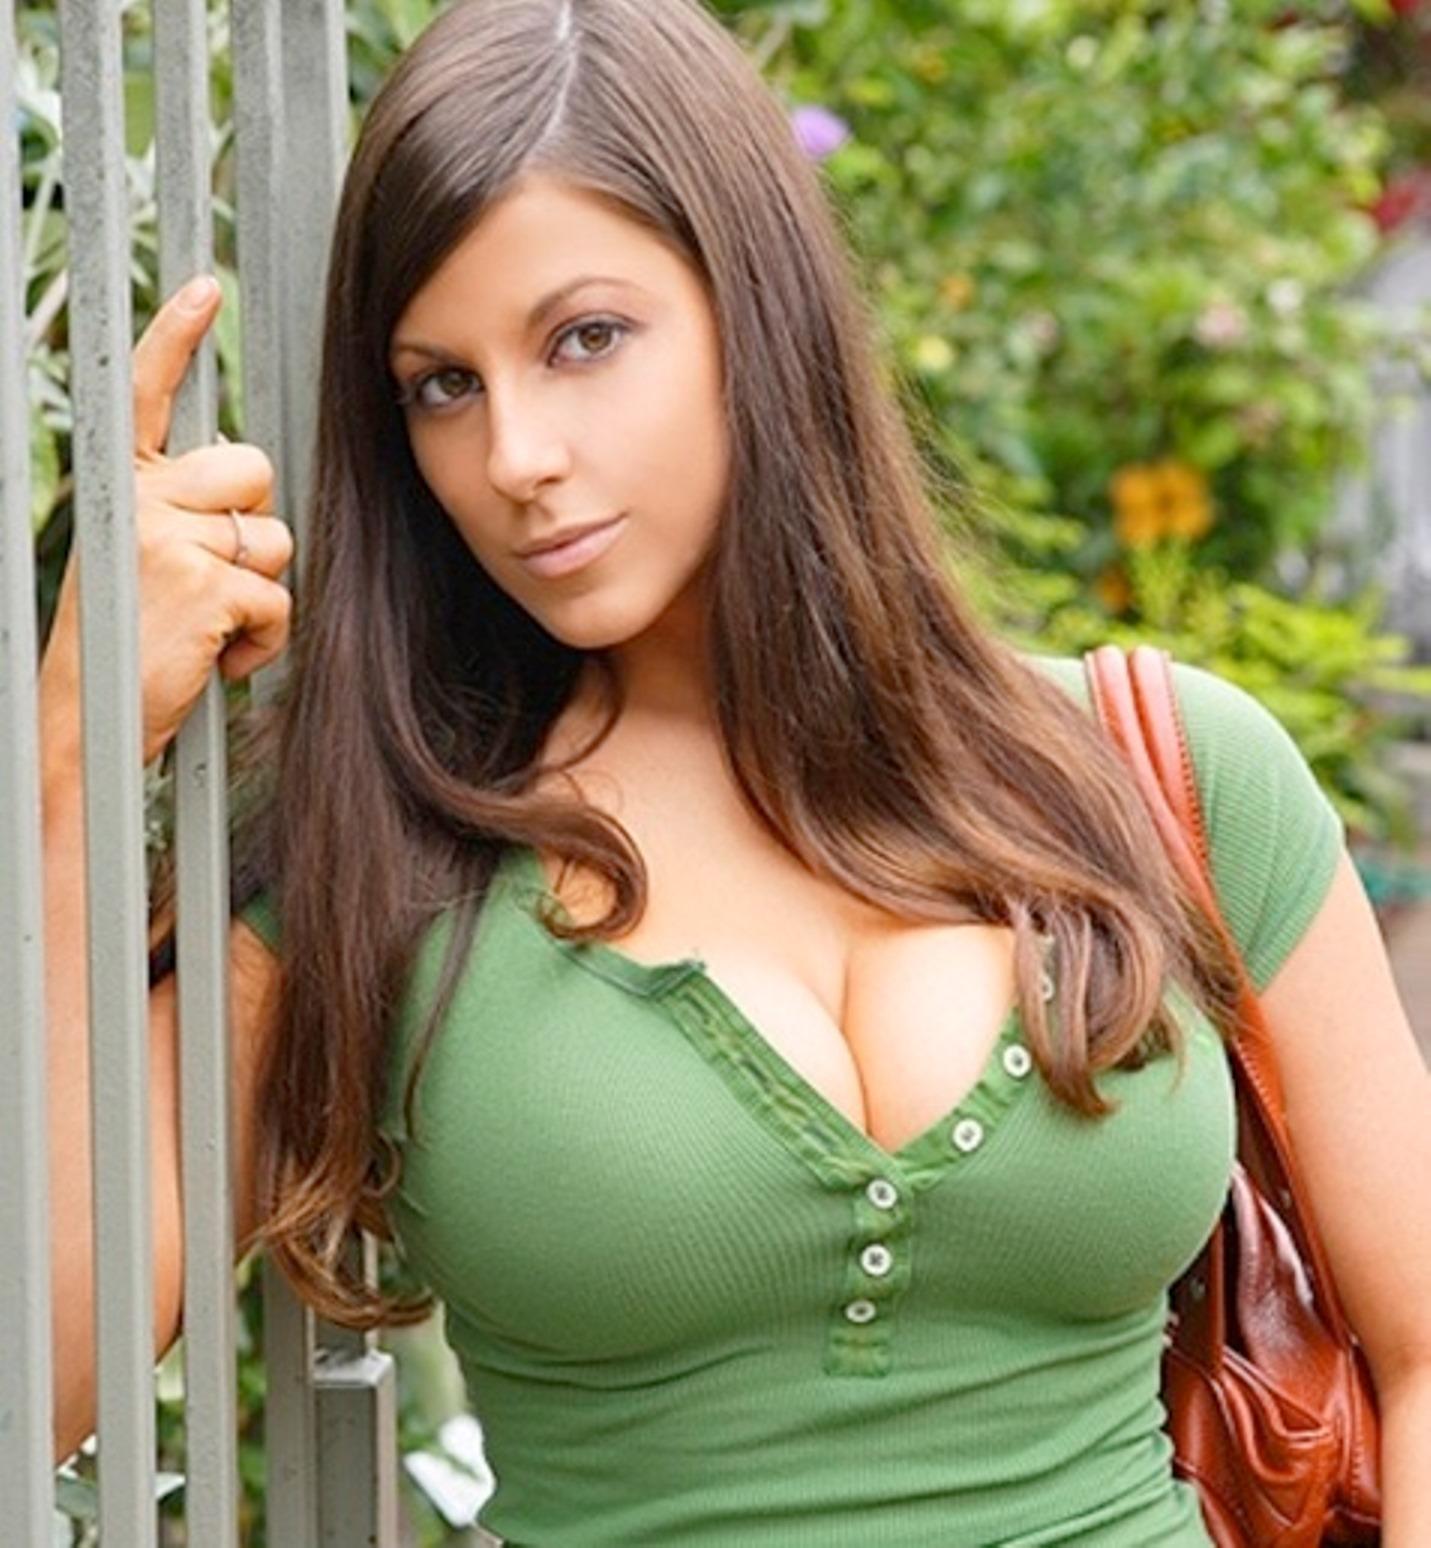 Gianna Michaels - Boobpedia - Encyclopedia of big boobs